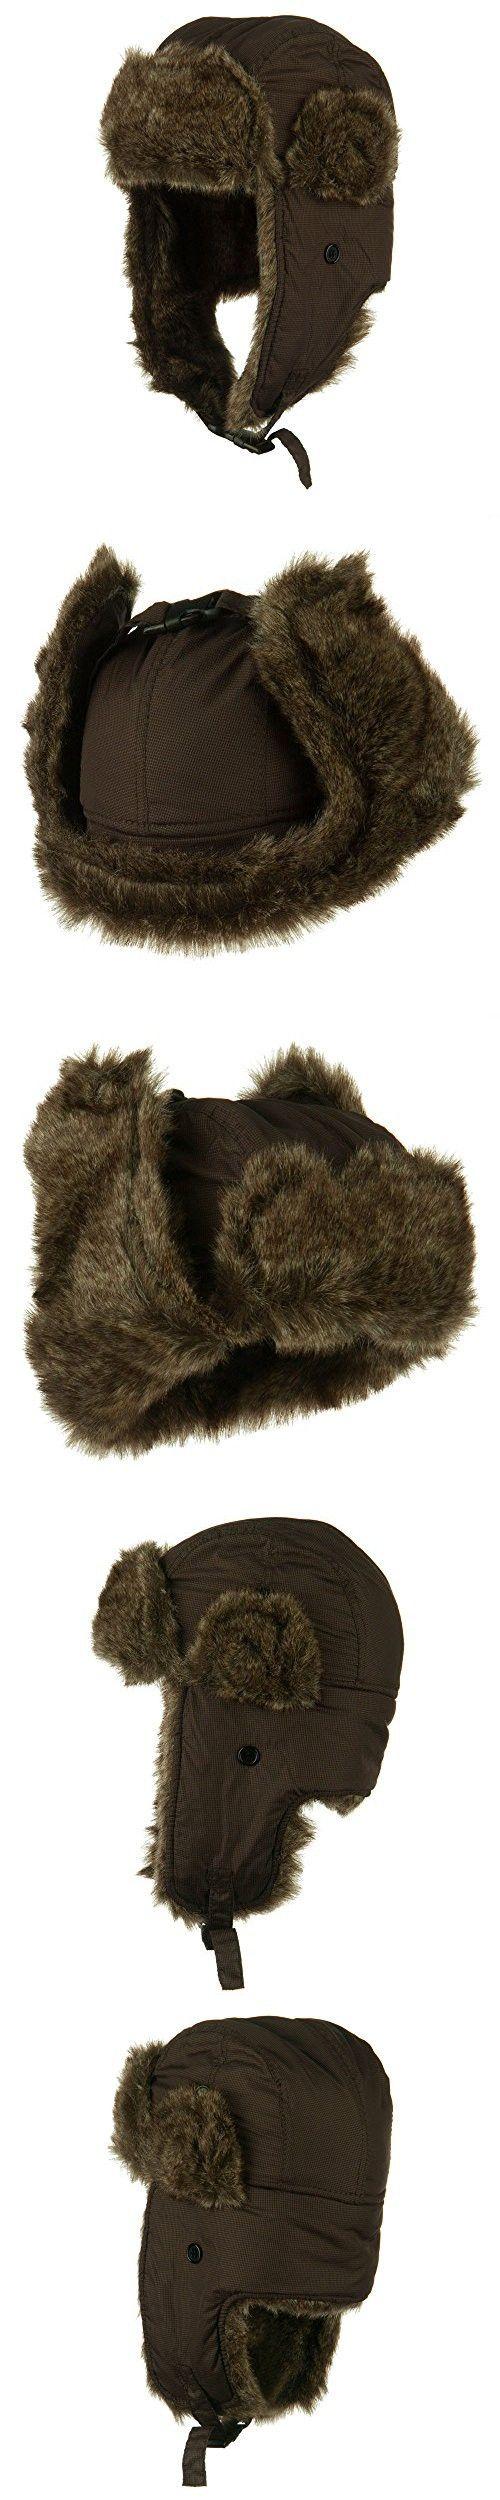 Boy's Ripstop Faux Fur Trooper Hat - Brown OSFM